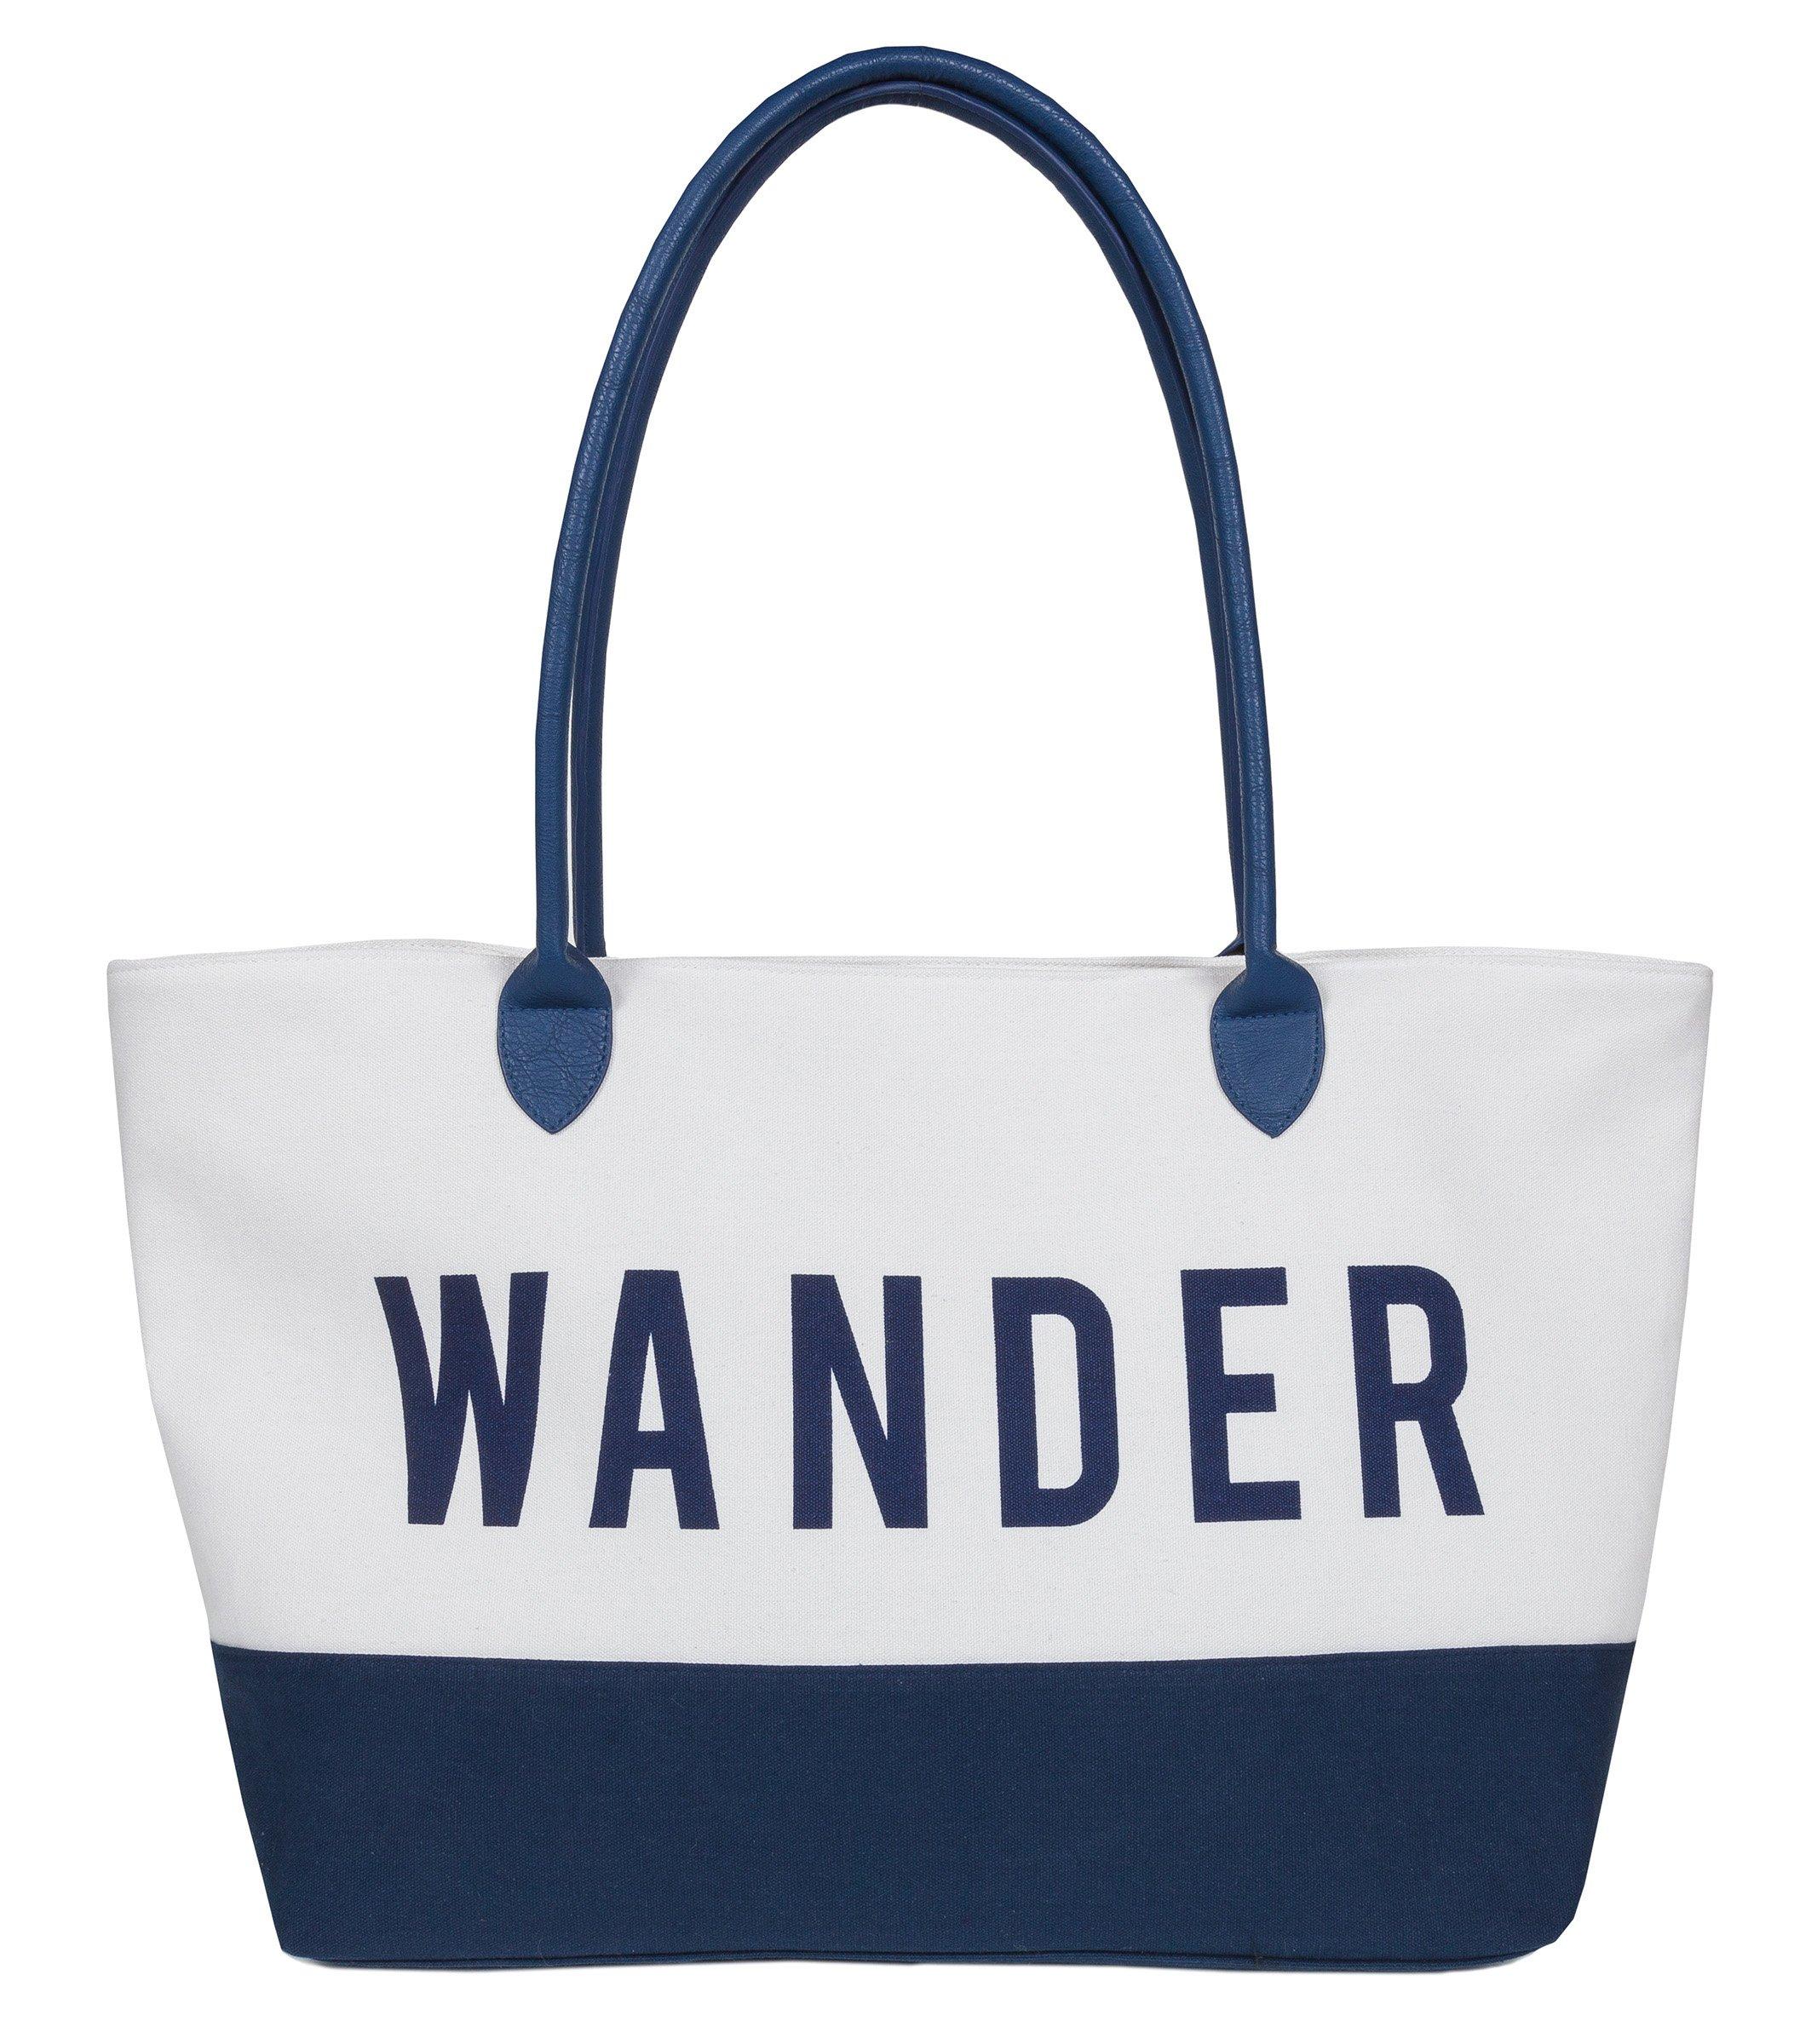 XL Large Women's Cotton Canvas Wander Zipper Tote Bag, Travel, Weekend, Beach, Carry On